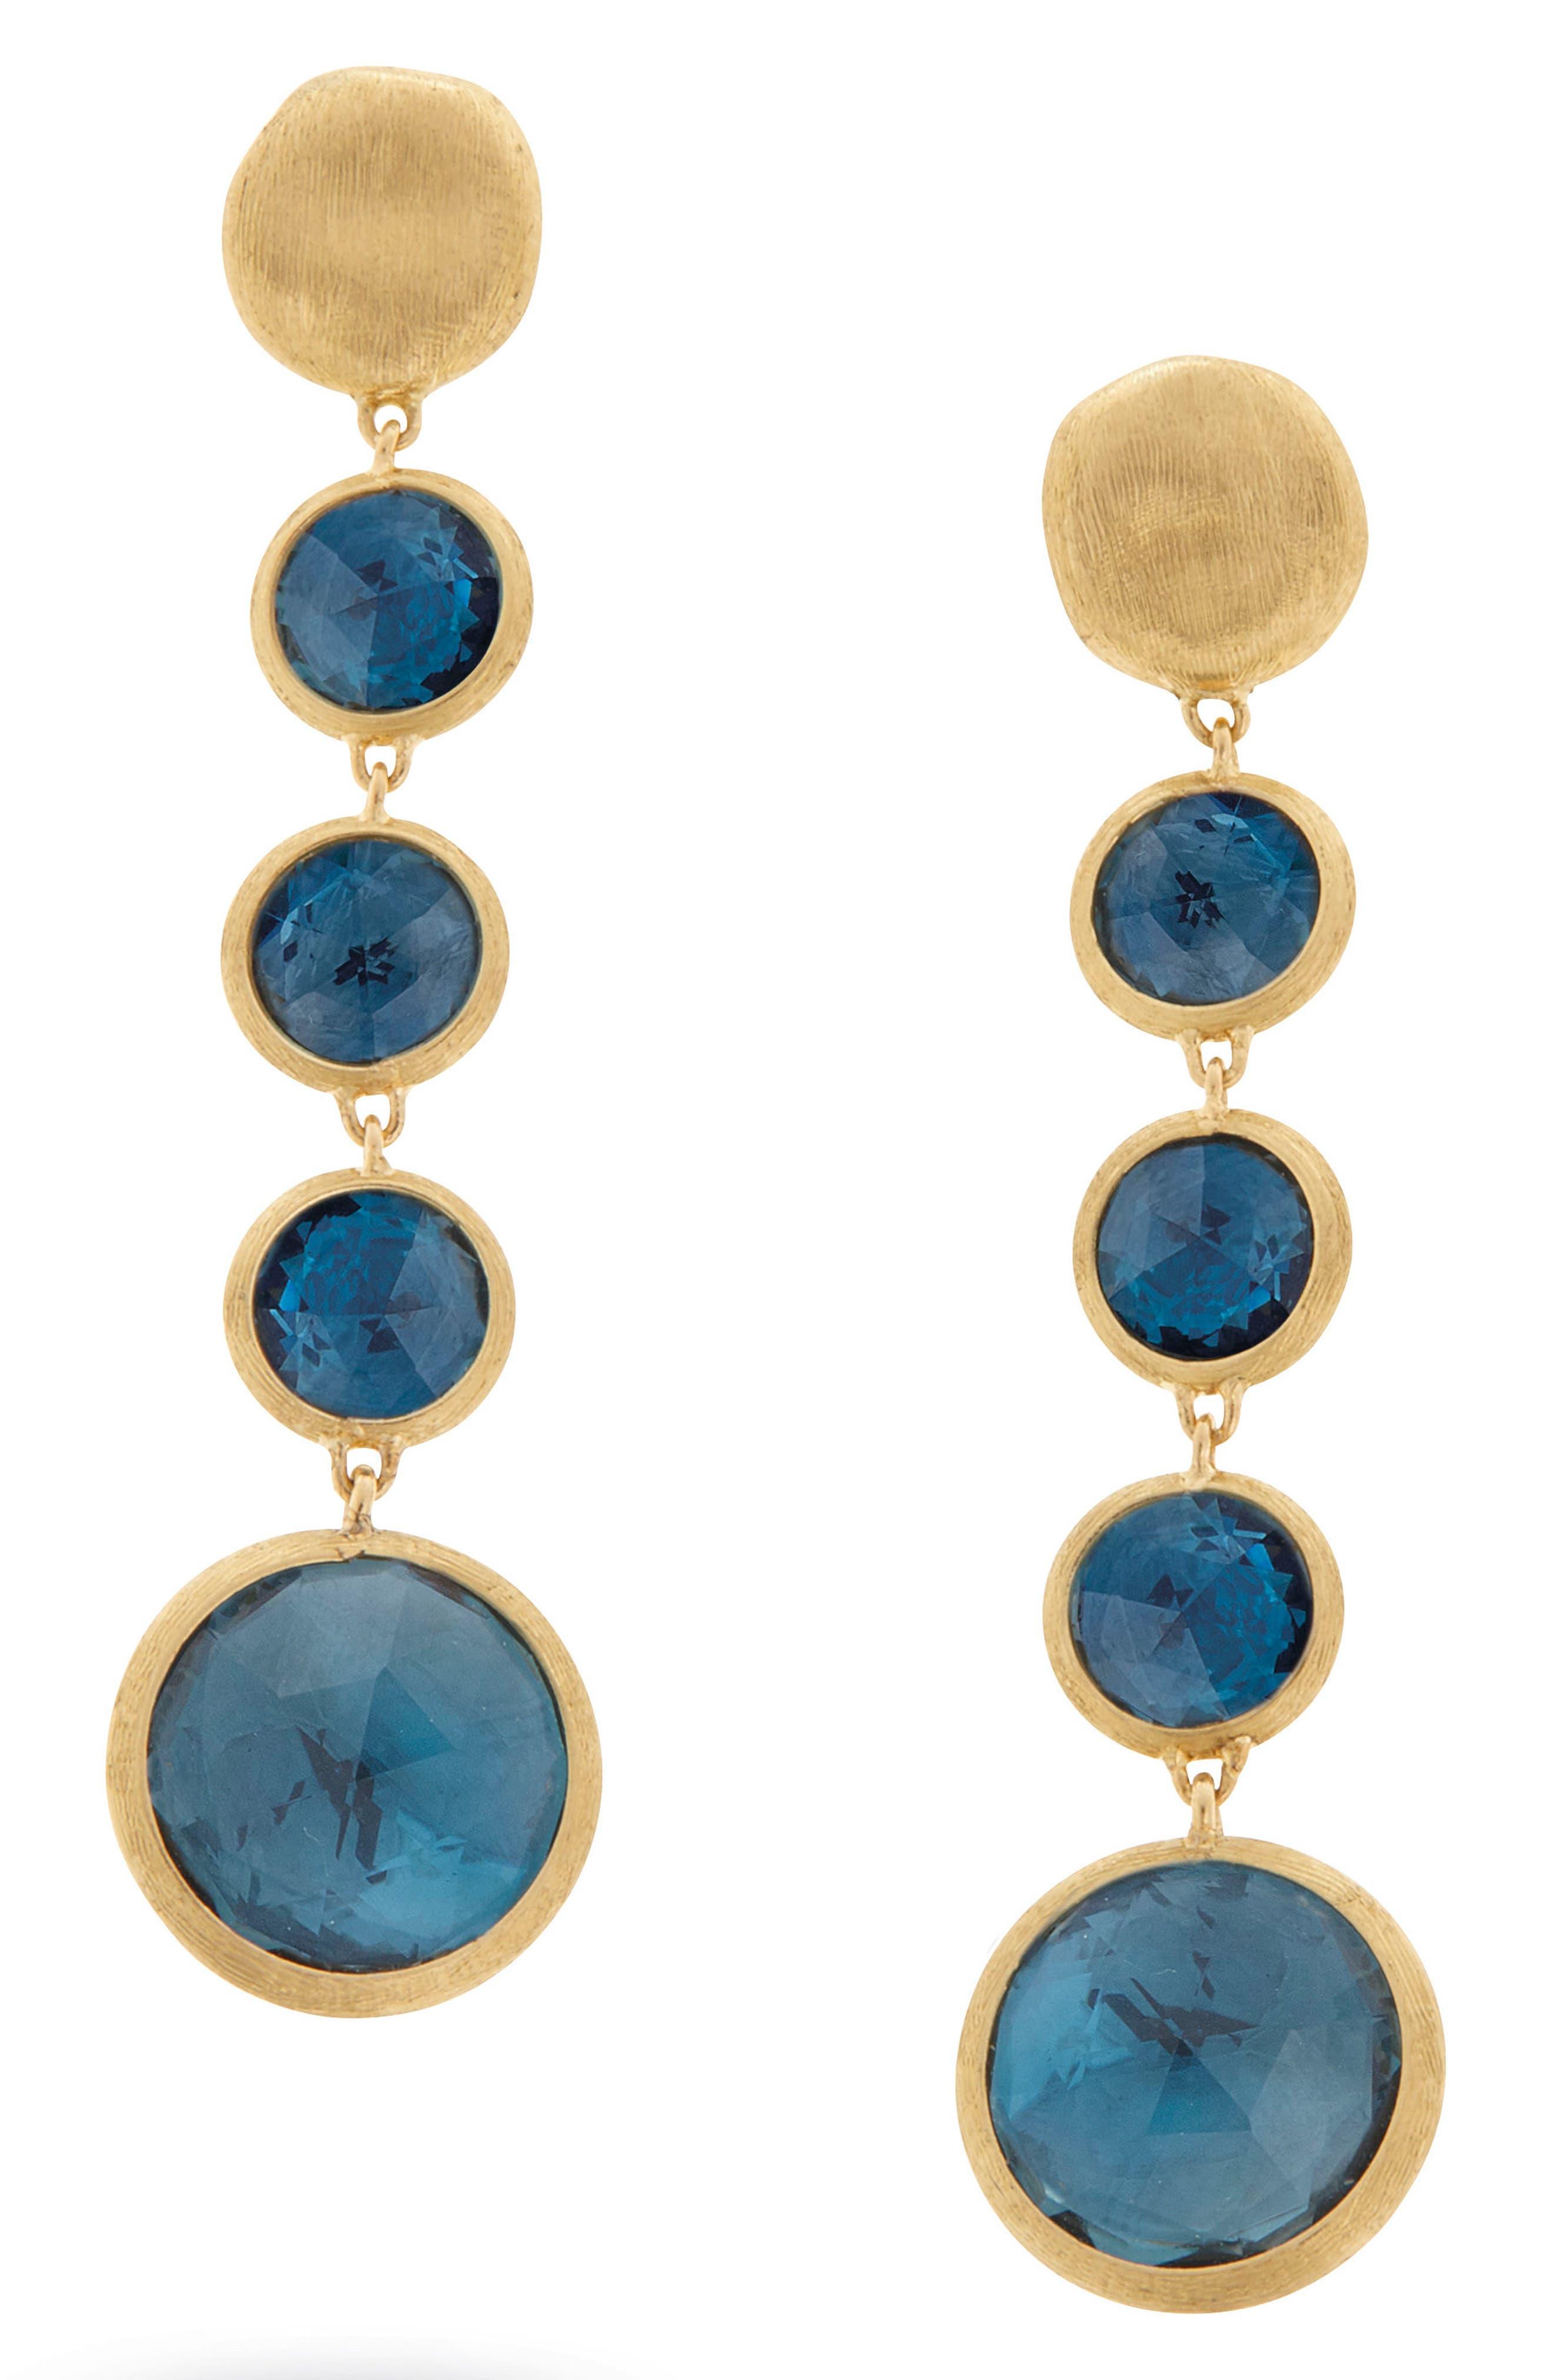 'Jaipur' Semiprecious Stone Linear Earrings,                             Main thumbnail 1, color,                             711